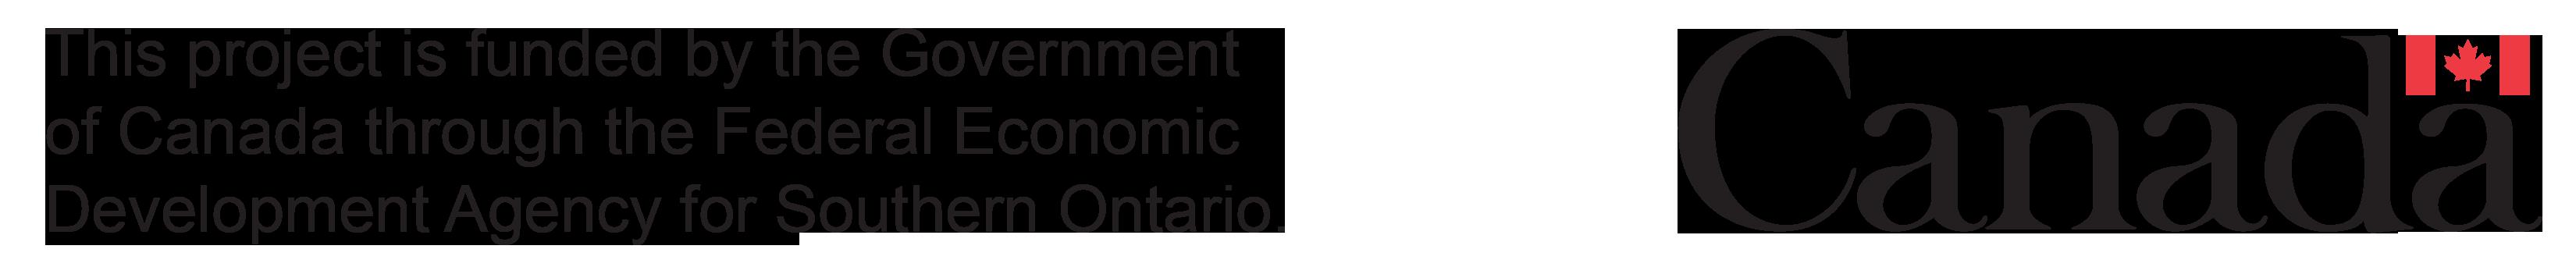 FedDev Ontario Logo